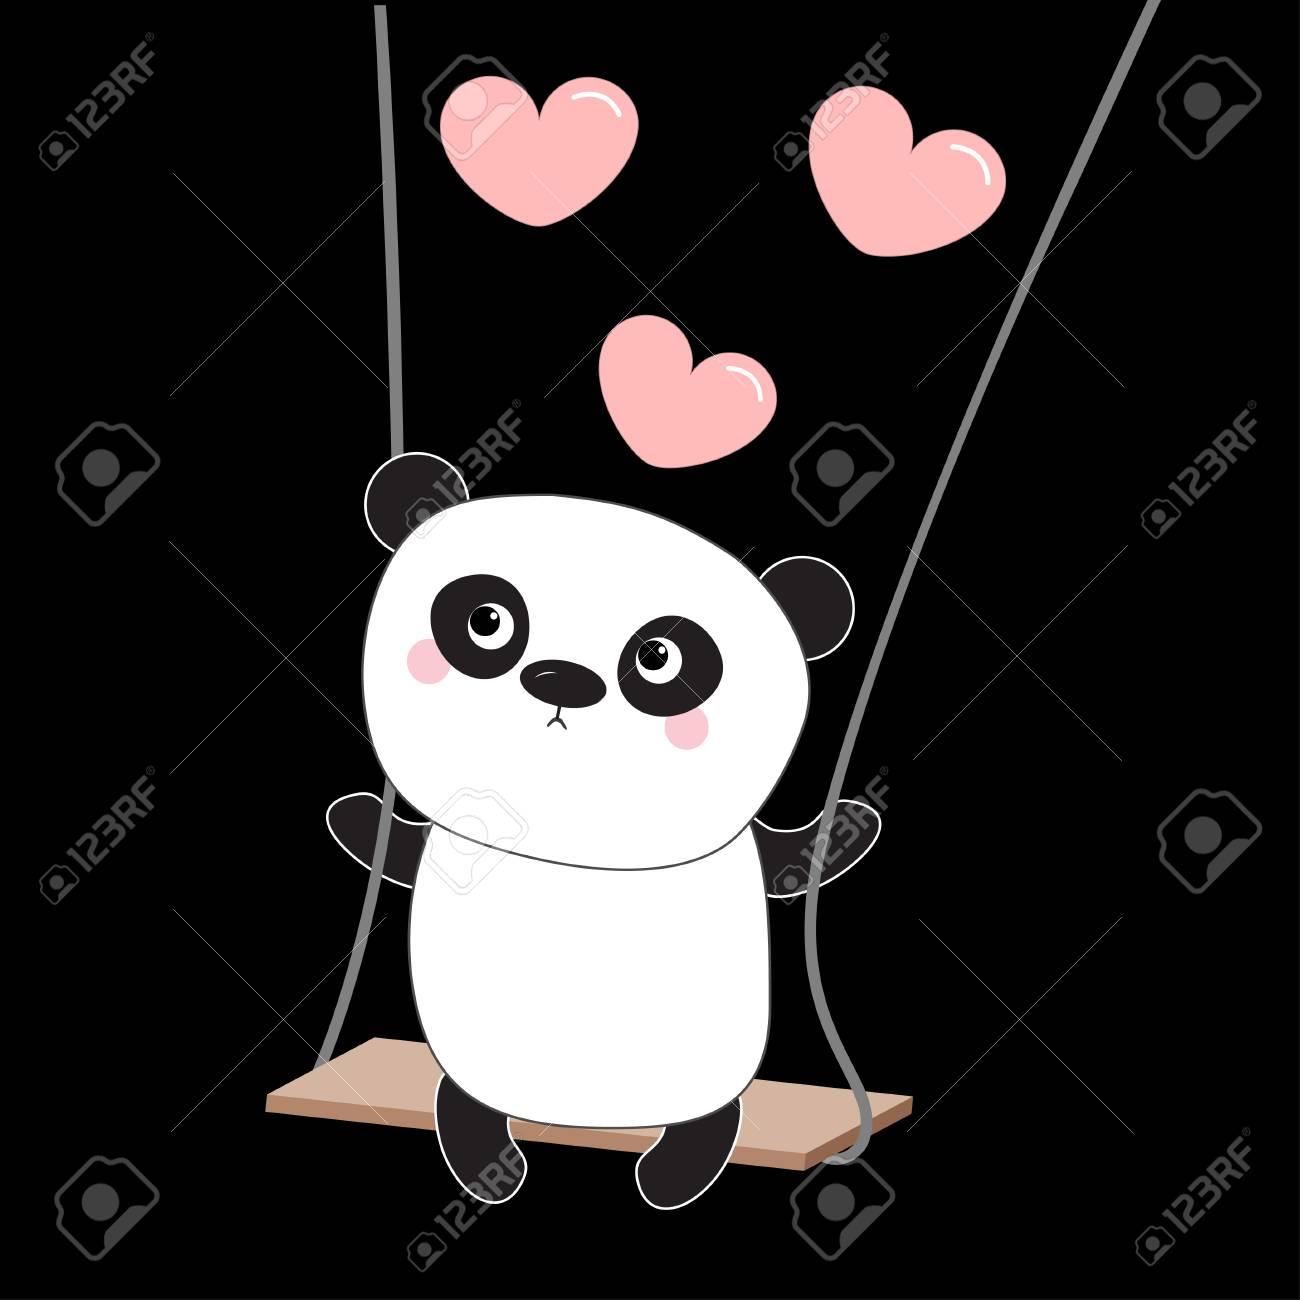 Panda ride on the swing pink flying hearts valentines day symbol pink flying hearts valentines day symbol cute fat biocorpaavc